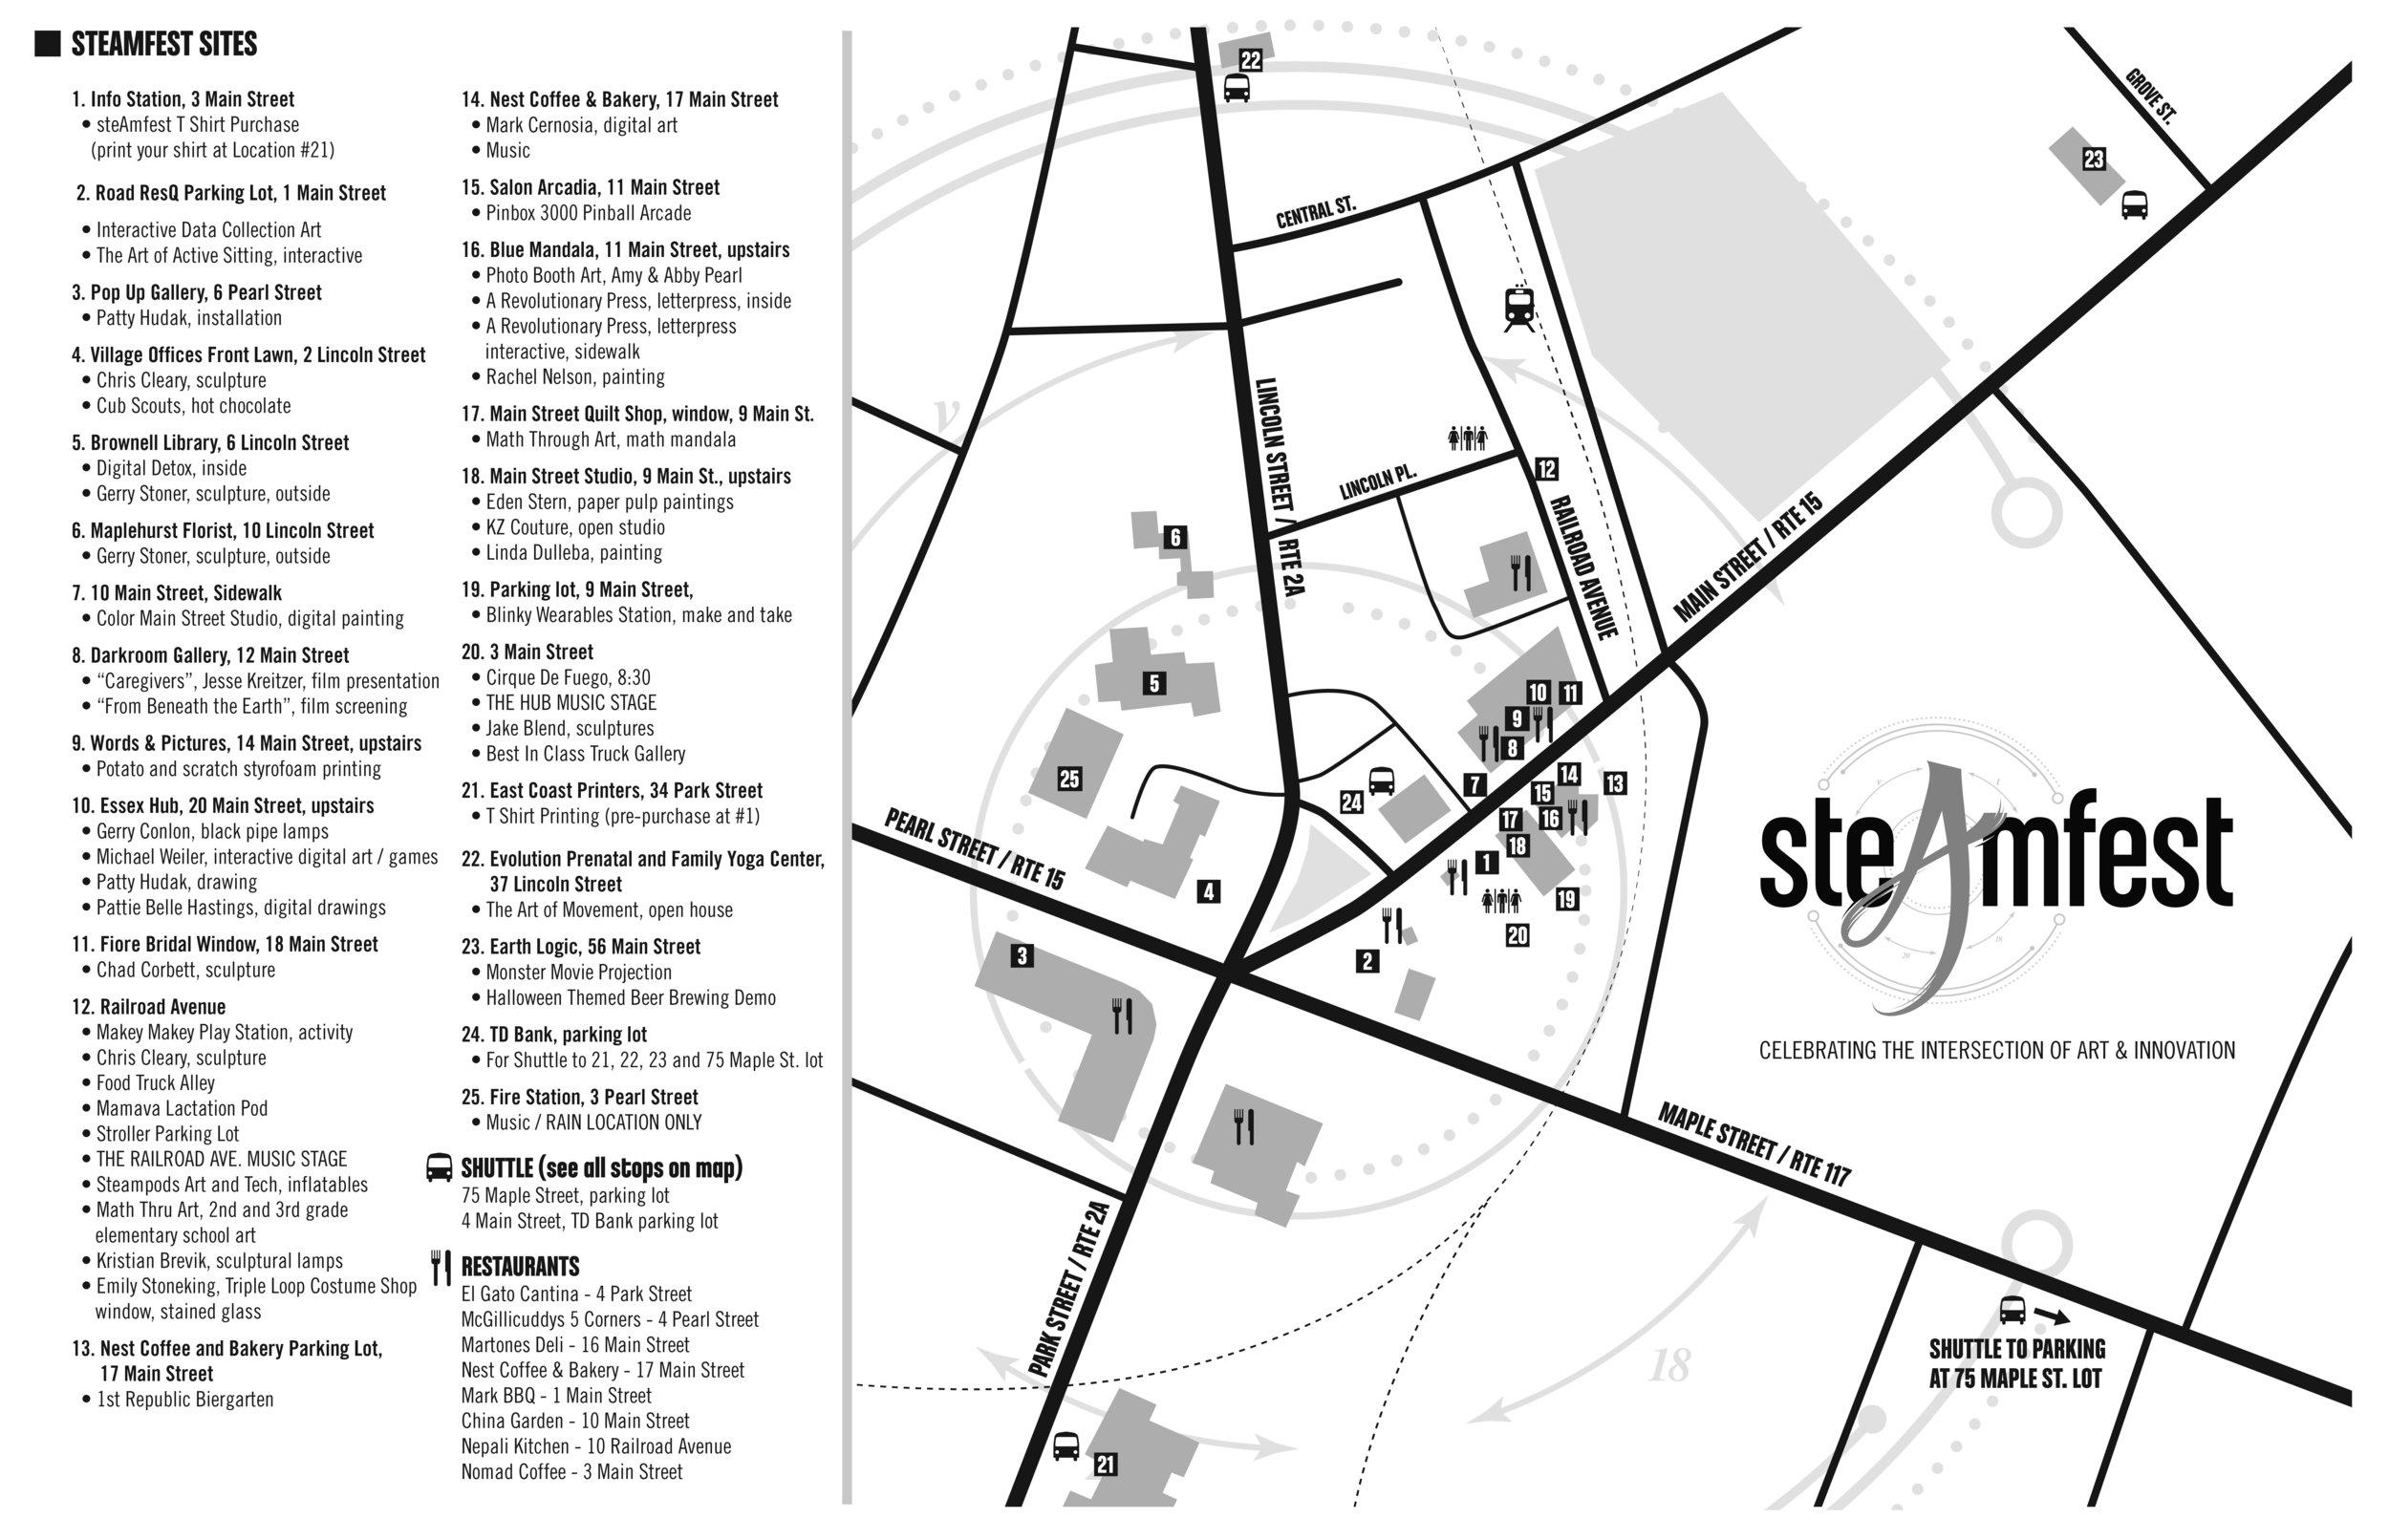 steAmfest-2018-map.jpg